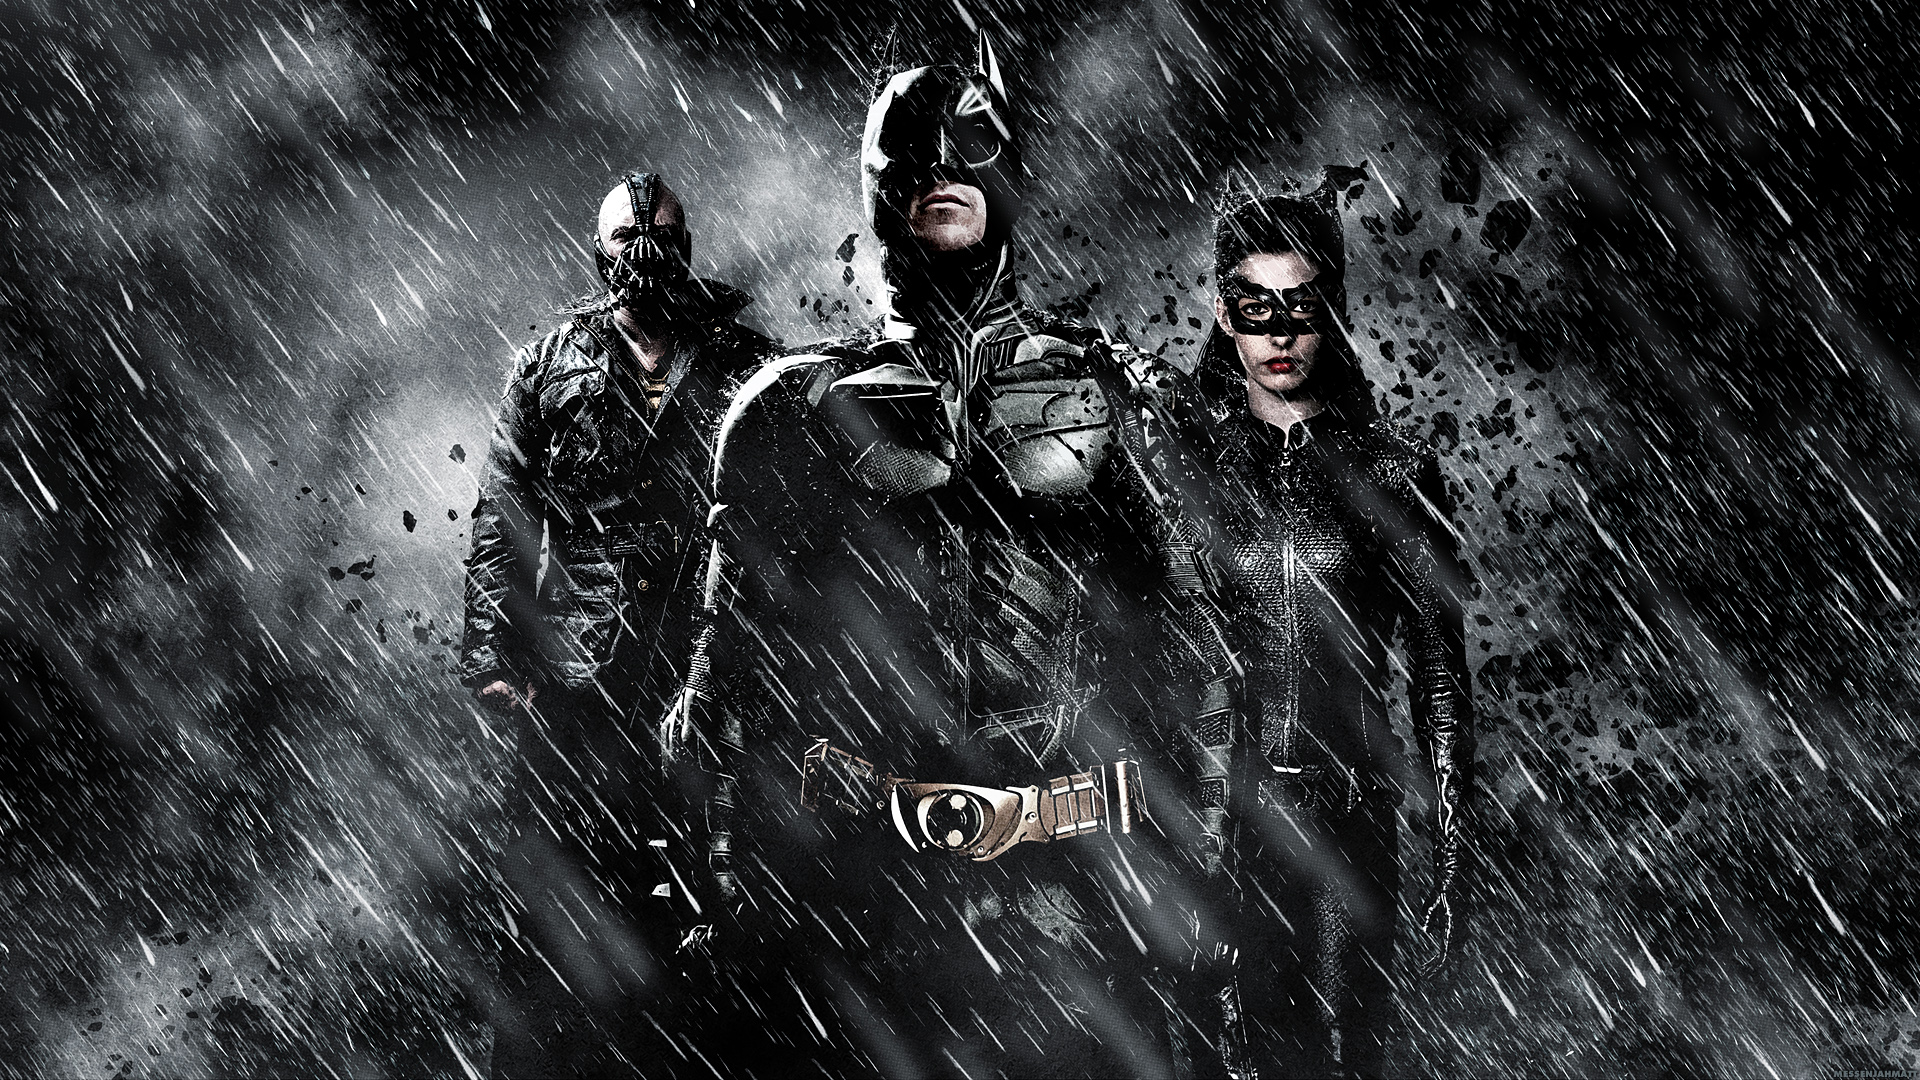 The-Dark-Knight-Rises-Movie